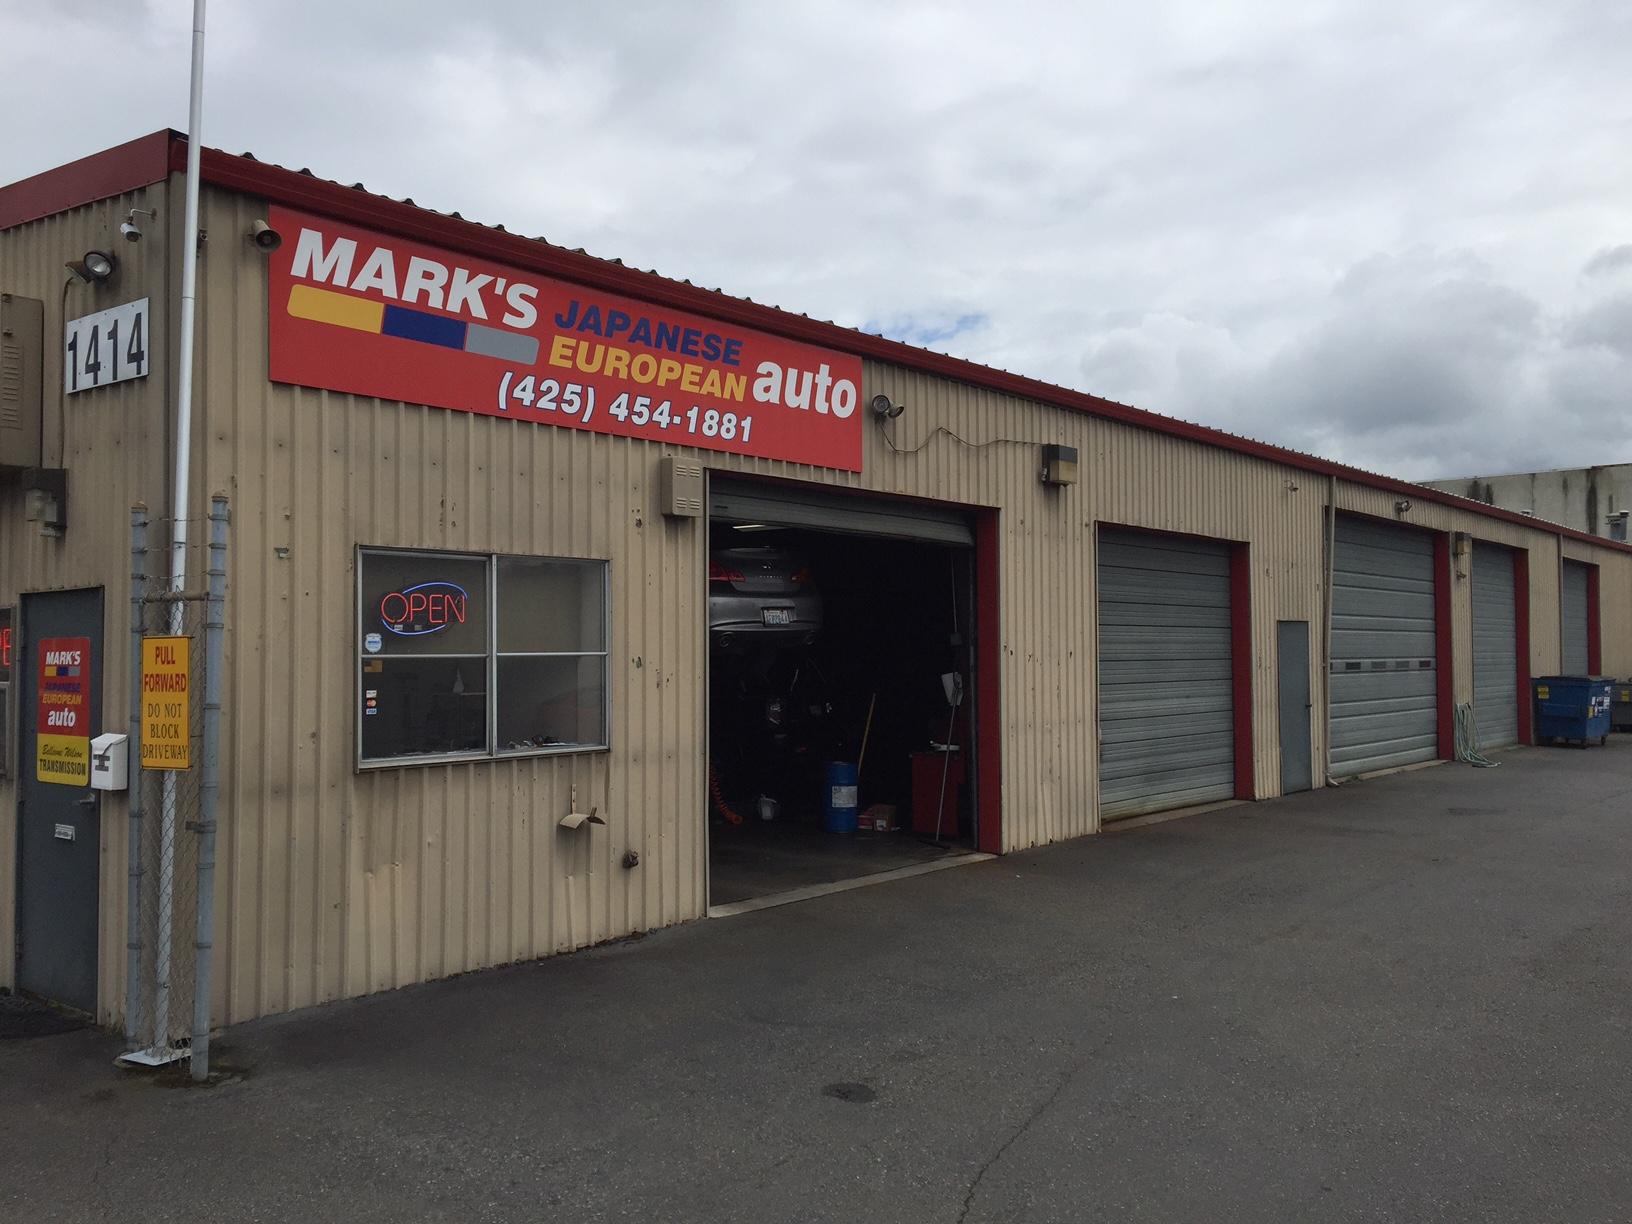 Mark's Japanese European Auto (Bellevue, WA)